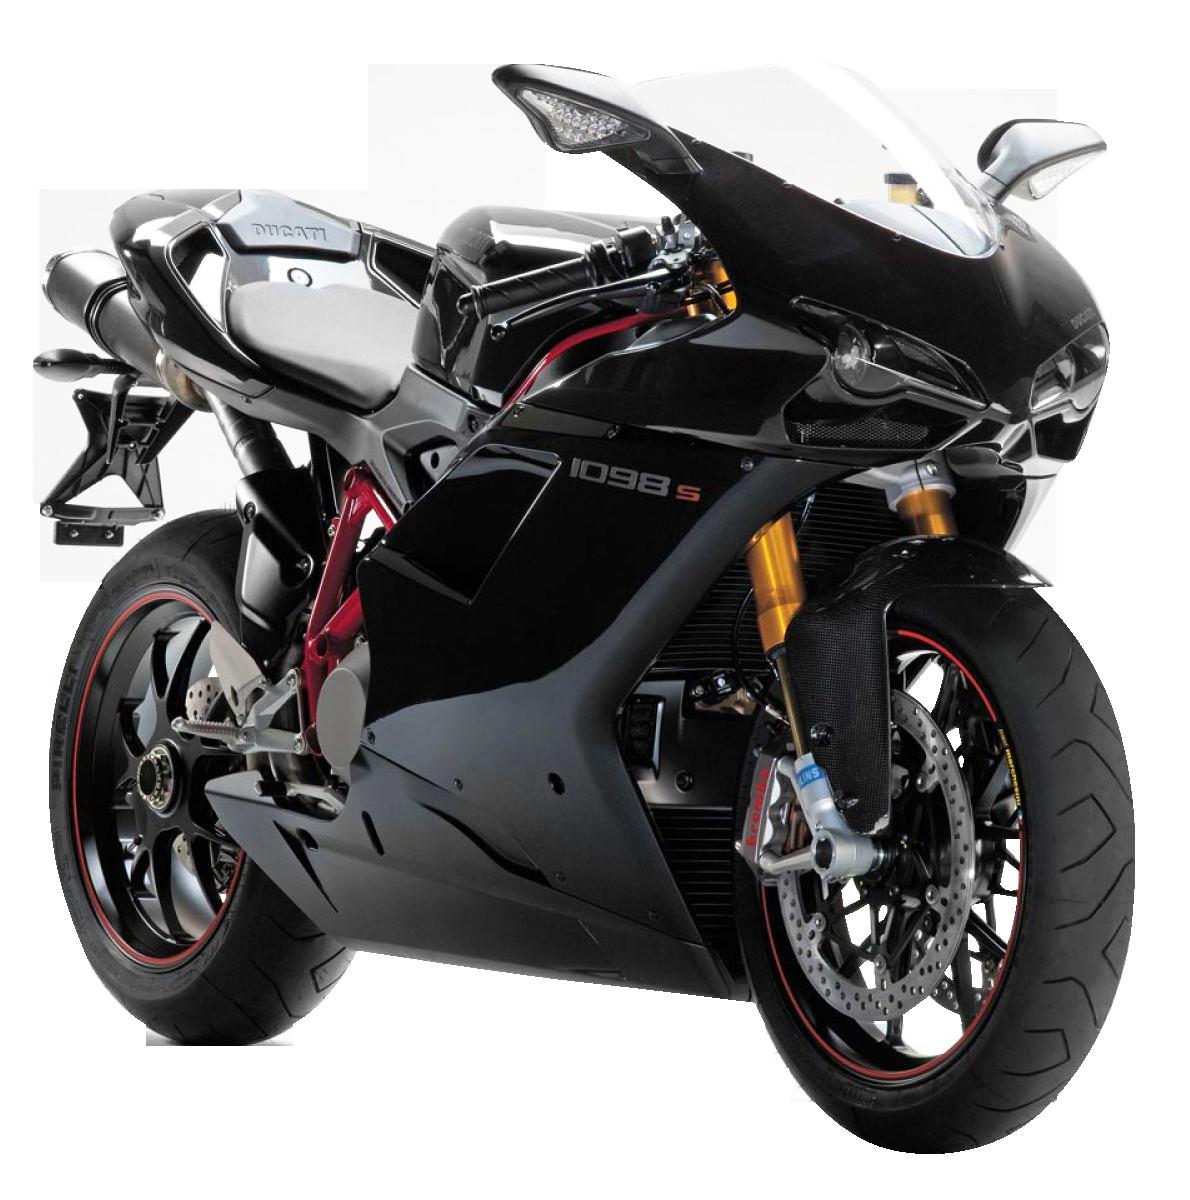 Ducati 1098 Png Image Ducati Ducati Motorcycles